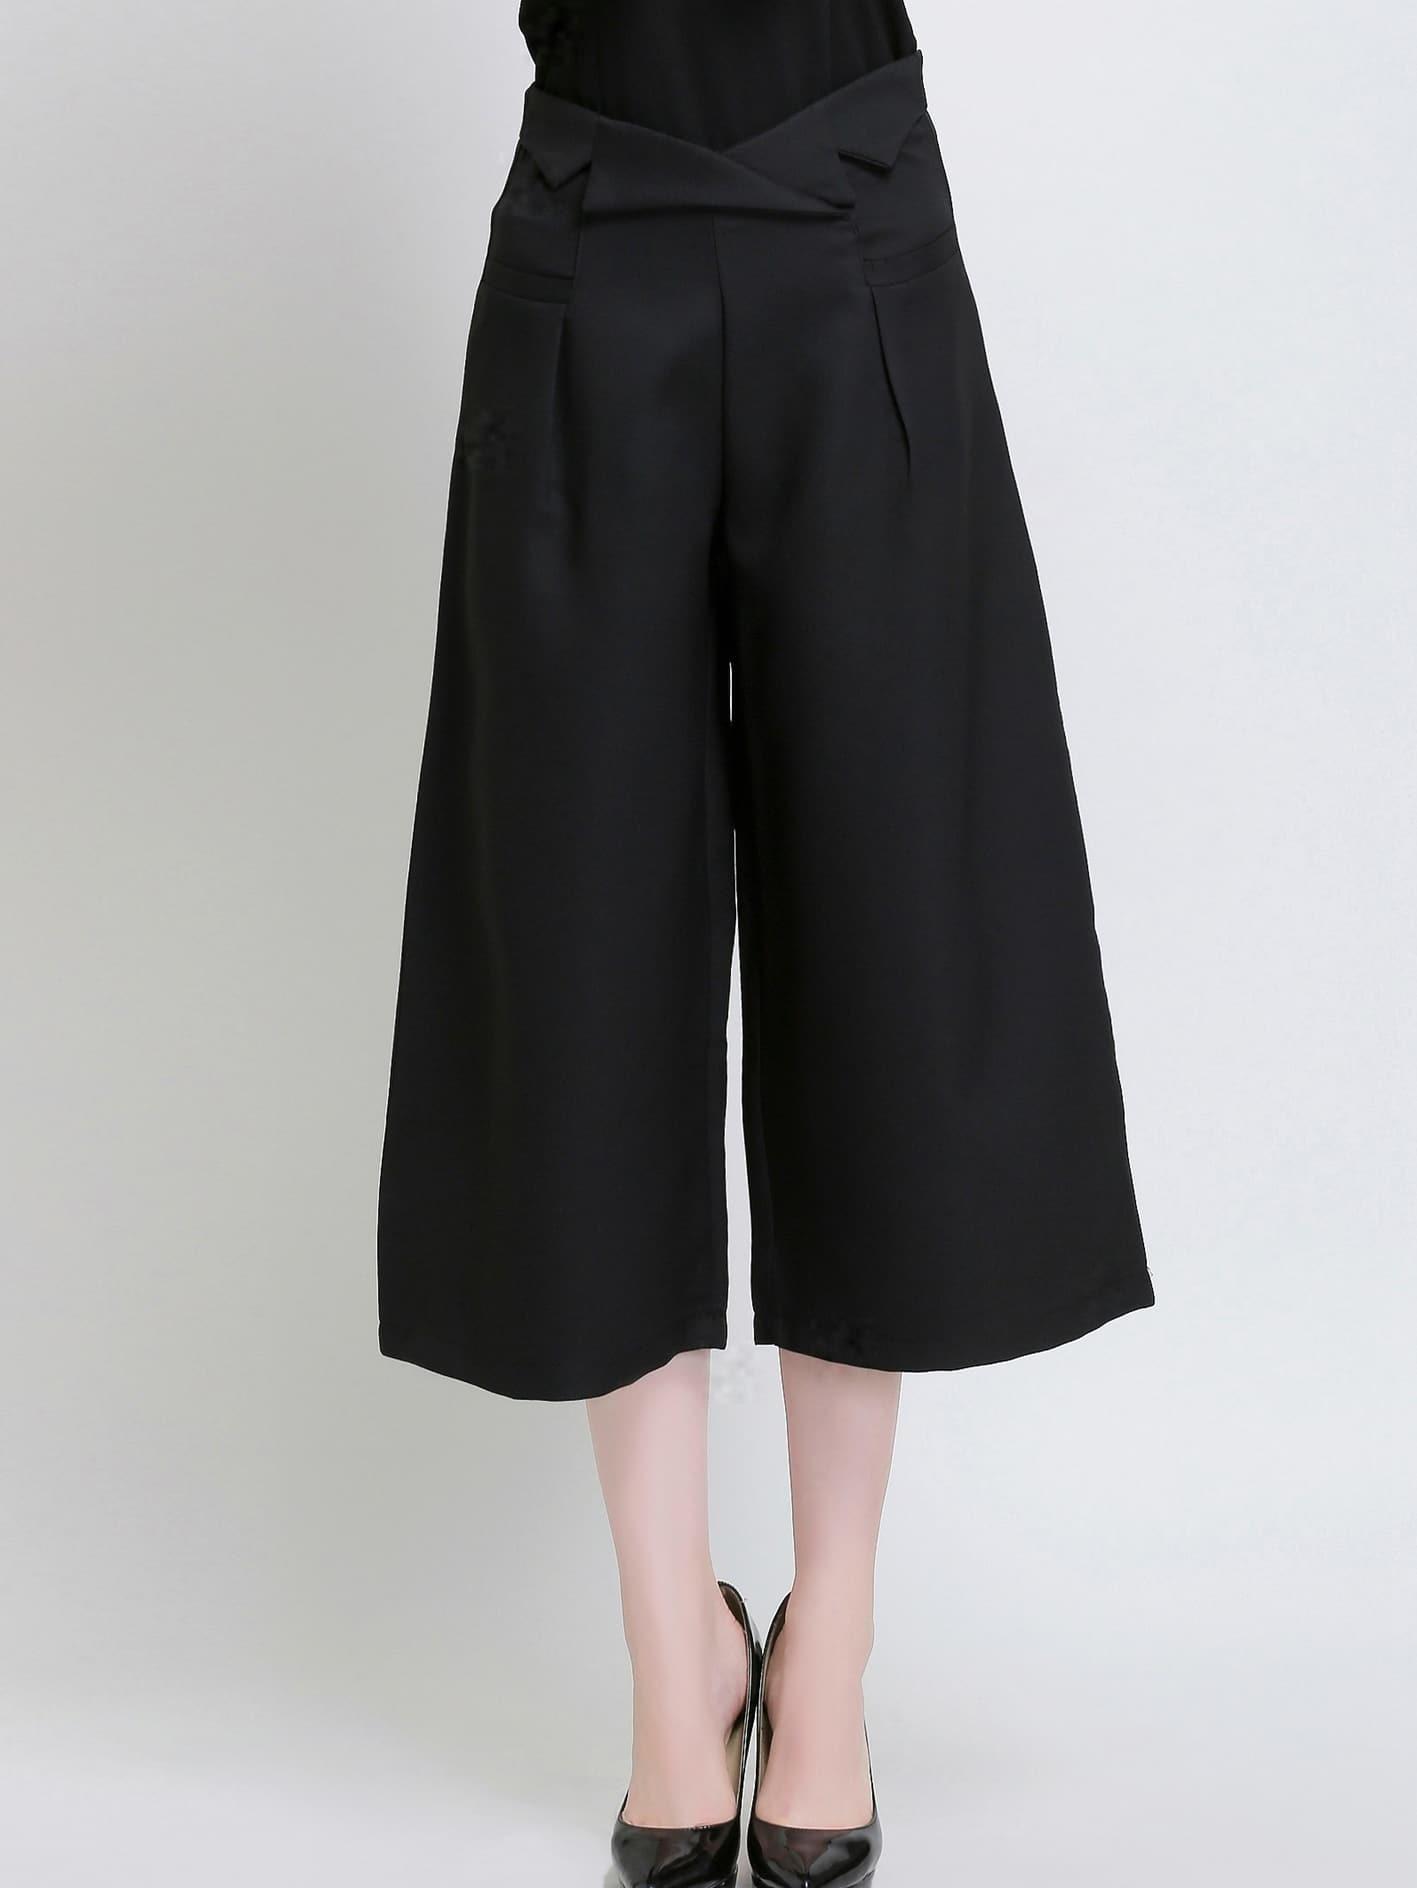 Black High Waist Wide Leg Pant